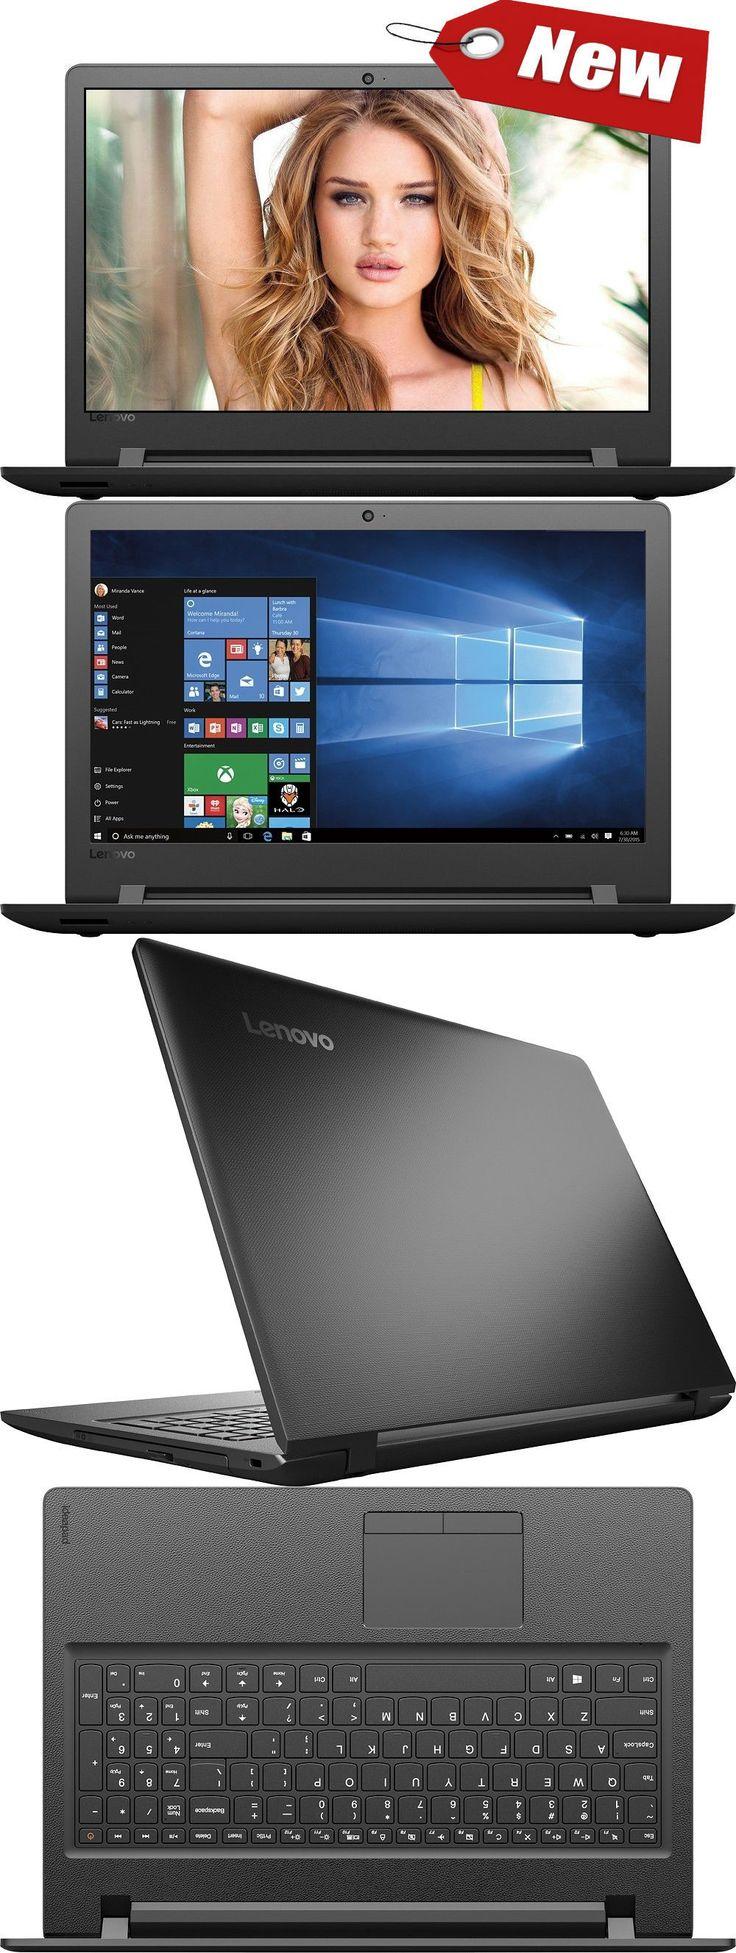 general for sale: New! Lenovo 8Gb 15.6 Windows 10 Laptop Intel Core I3-6100U 1Tb Dvd+Rw Bluetooth -> BUY IT NOW ONLY: $395.95 on eBay!